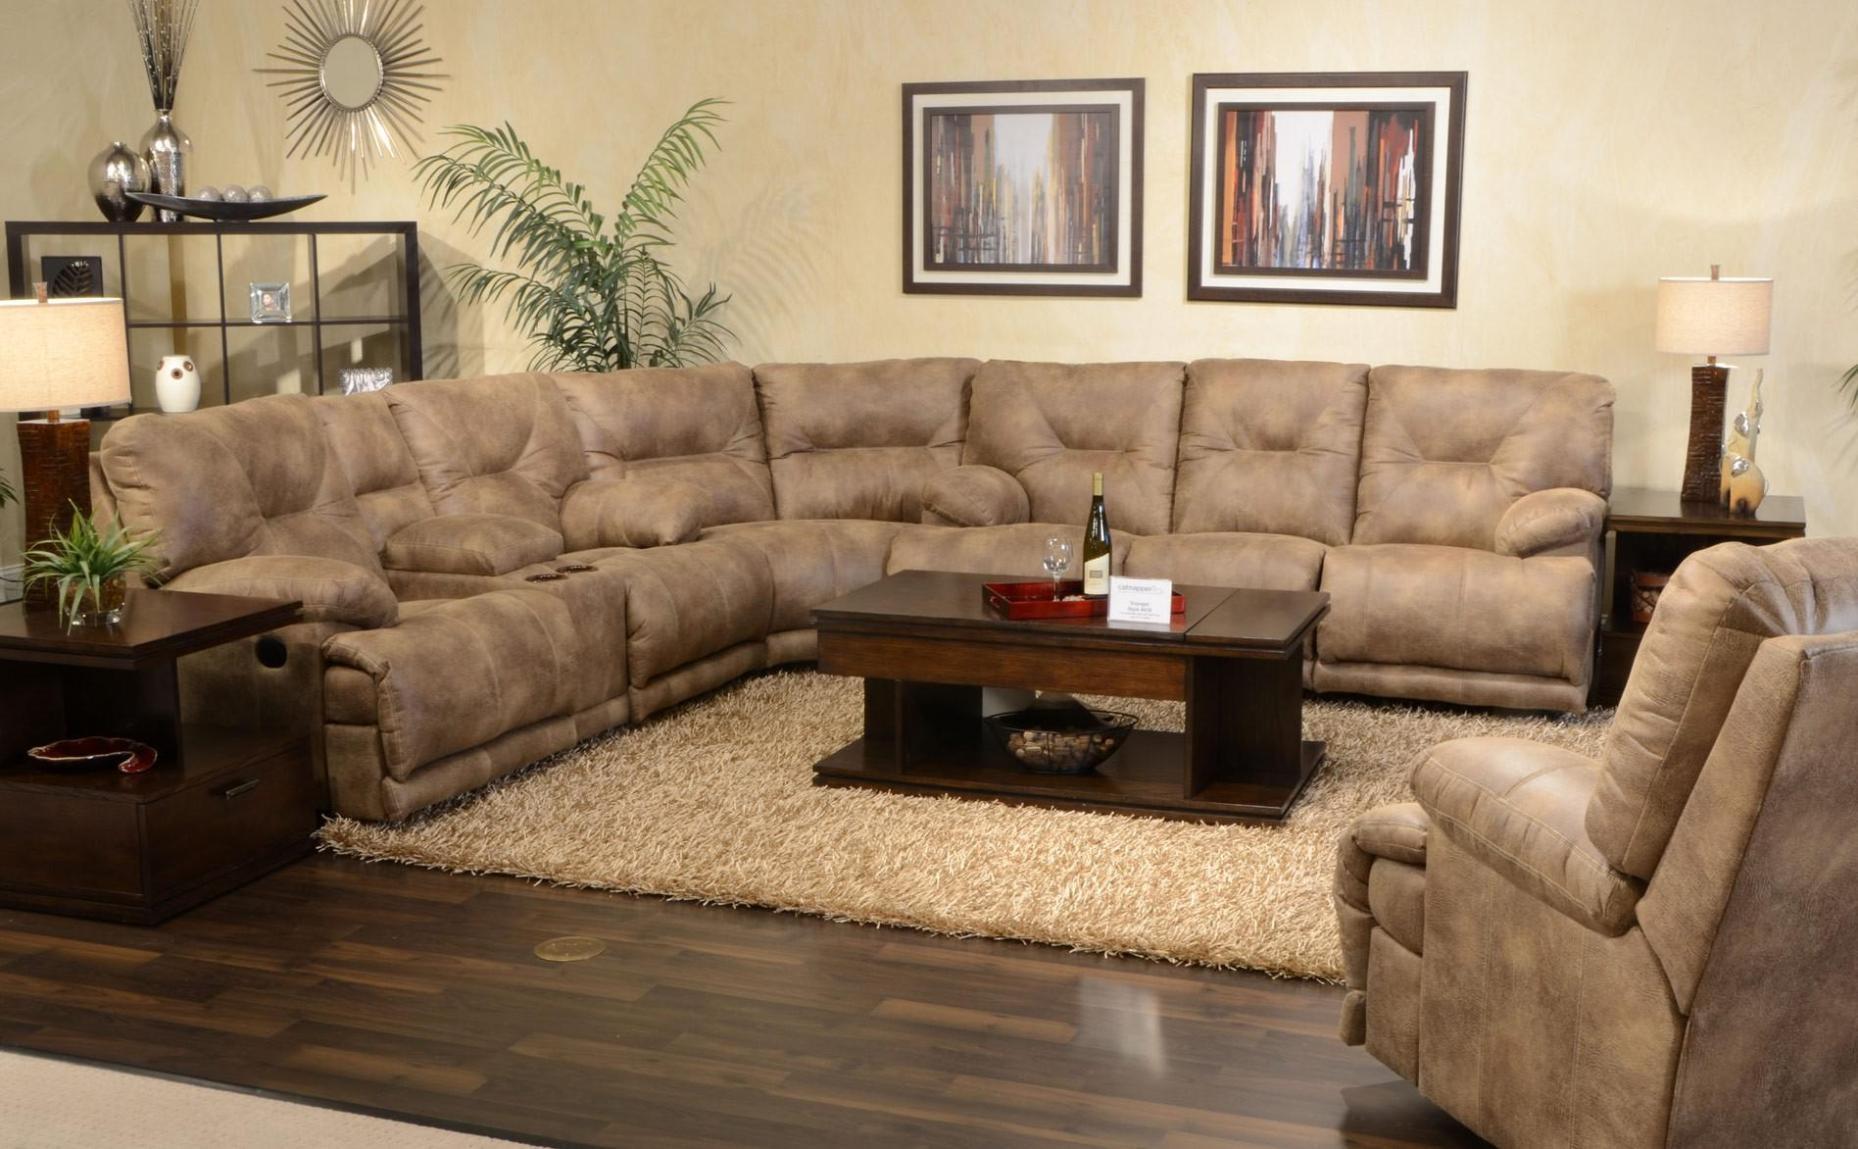 Sofa : Amazing Braxton Sectional Sofa Beautiful Home Design Regarding Braxton Sectional Sofas (View 19 of 20)